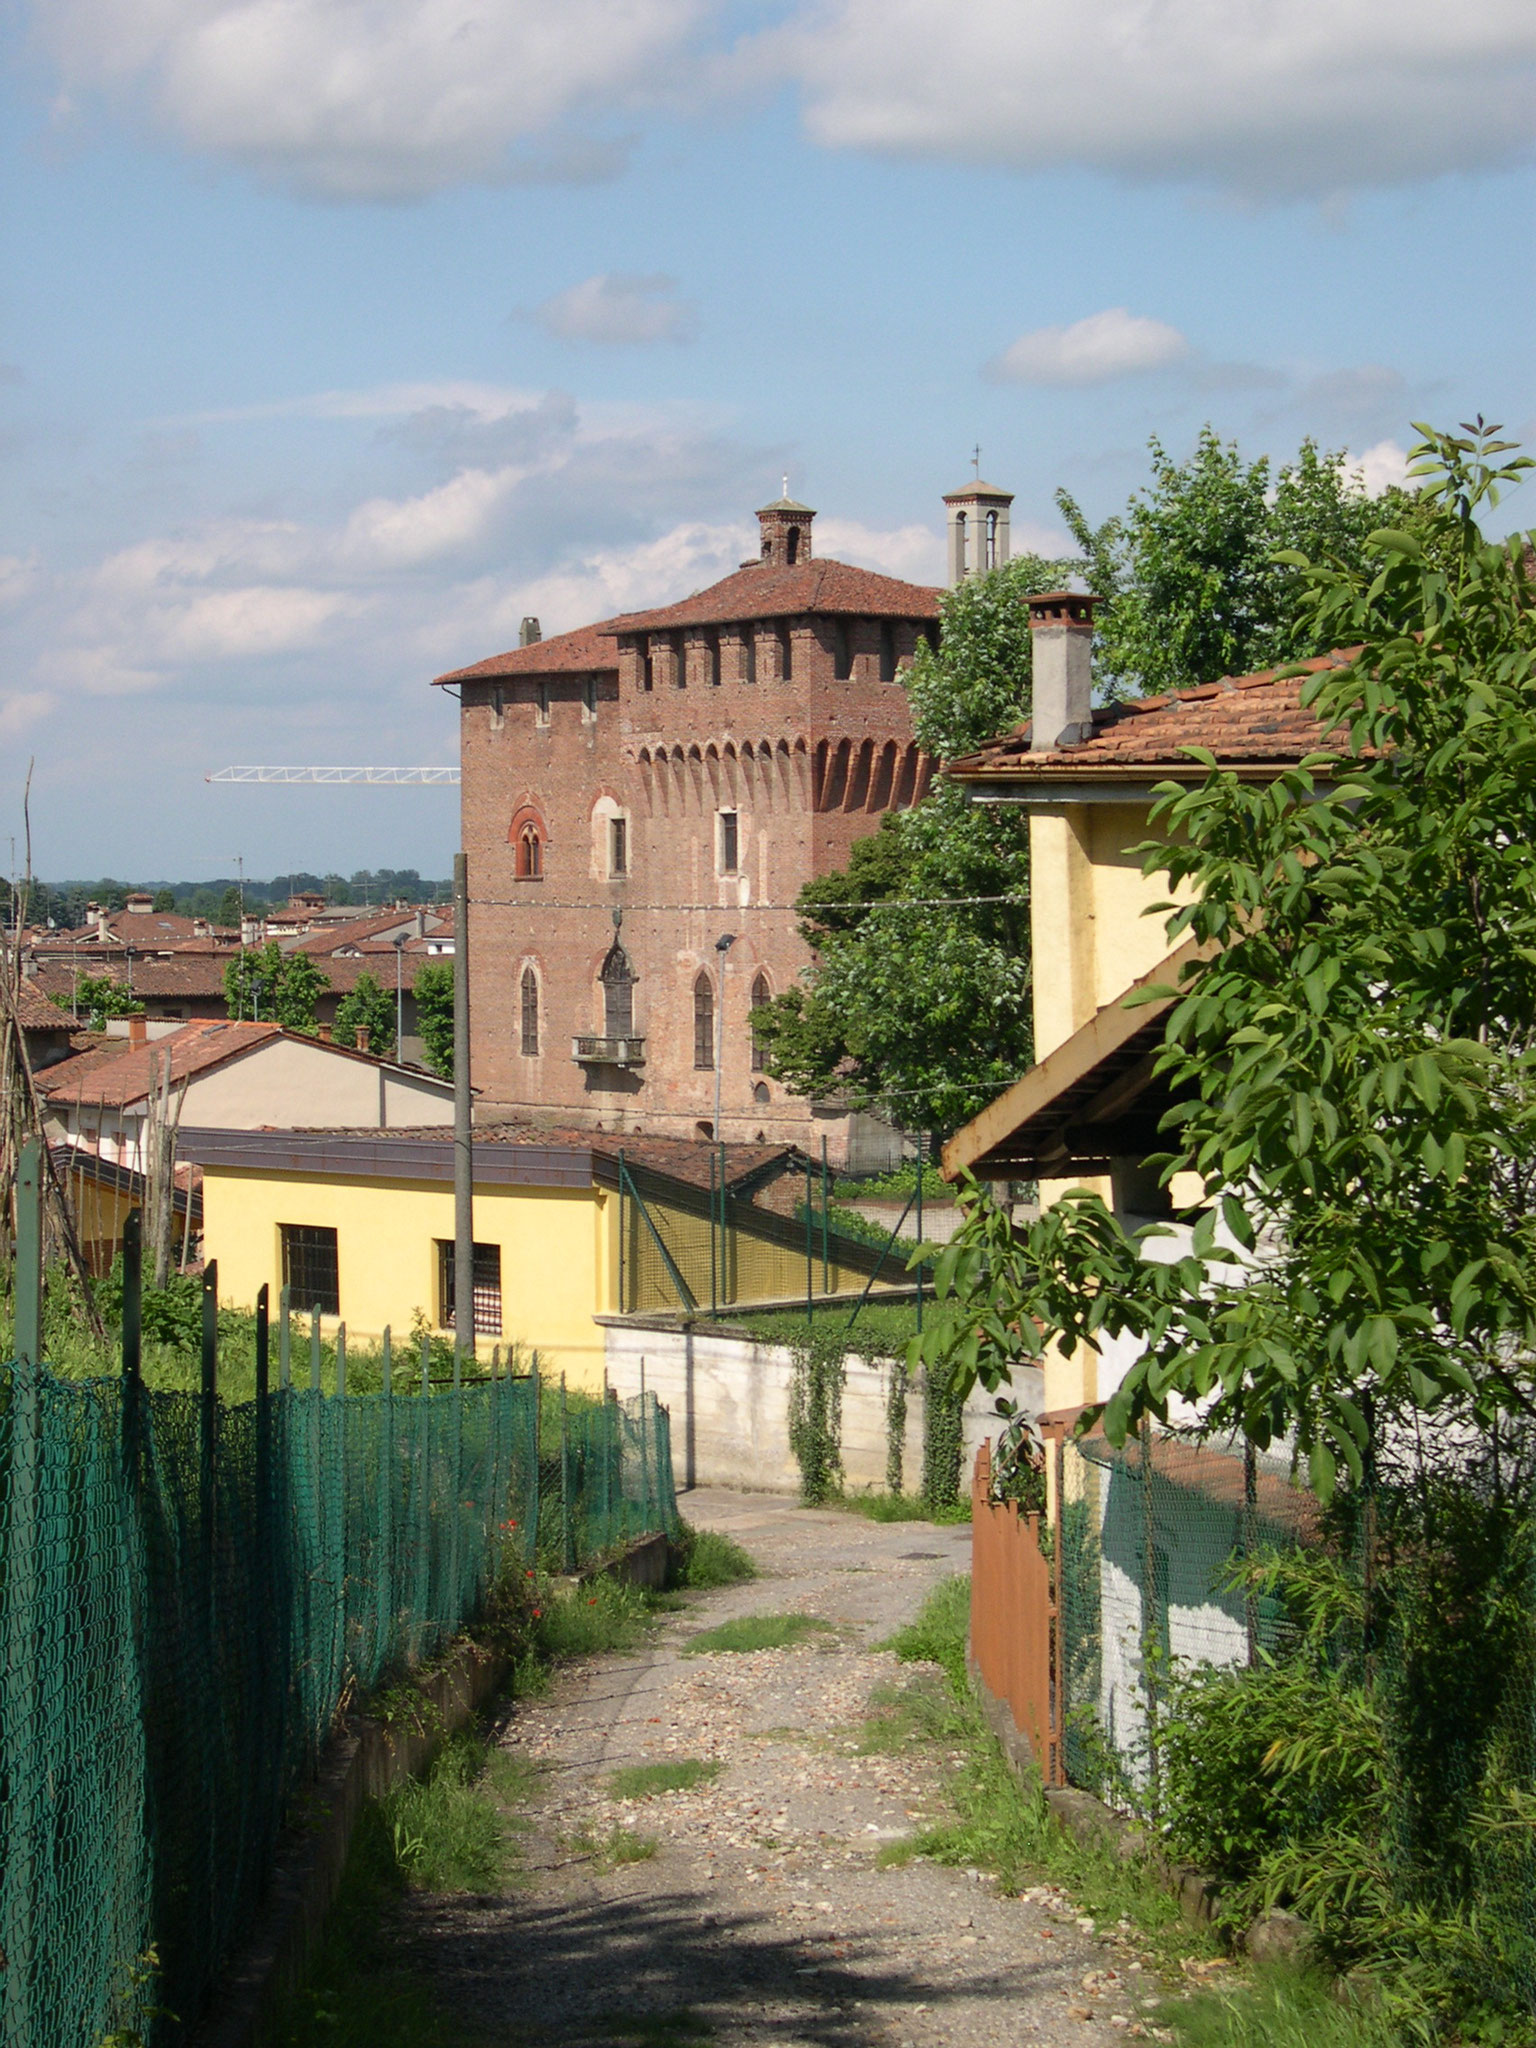 La torre Castellana